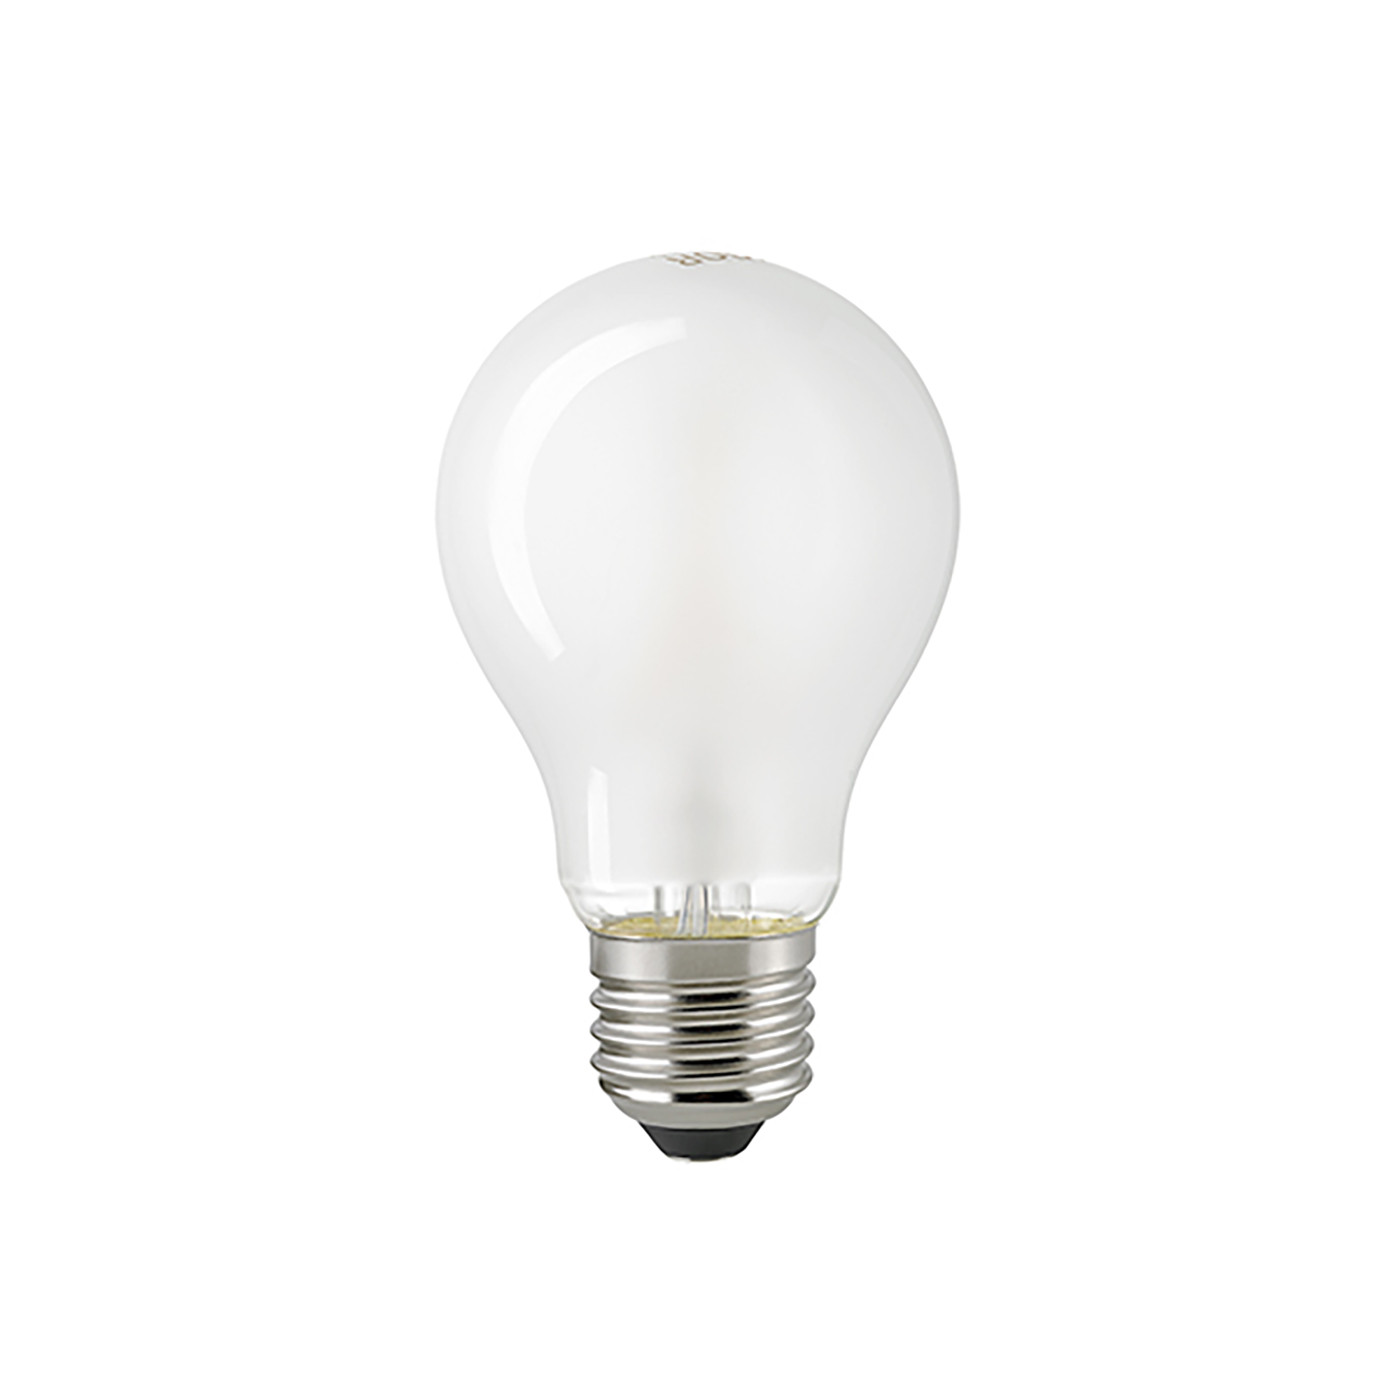 Sigor LED filament bulb shaped A60 2,5W 2700K 230V E27 matt